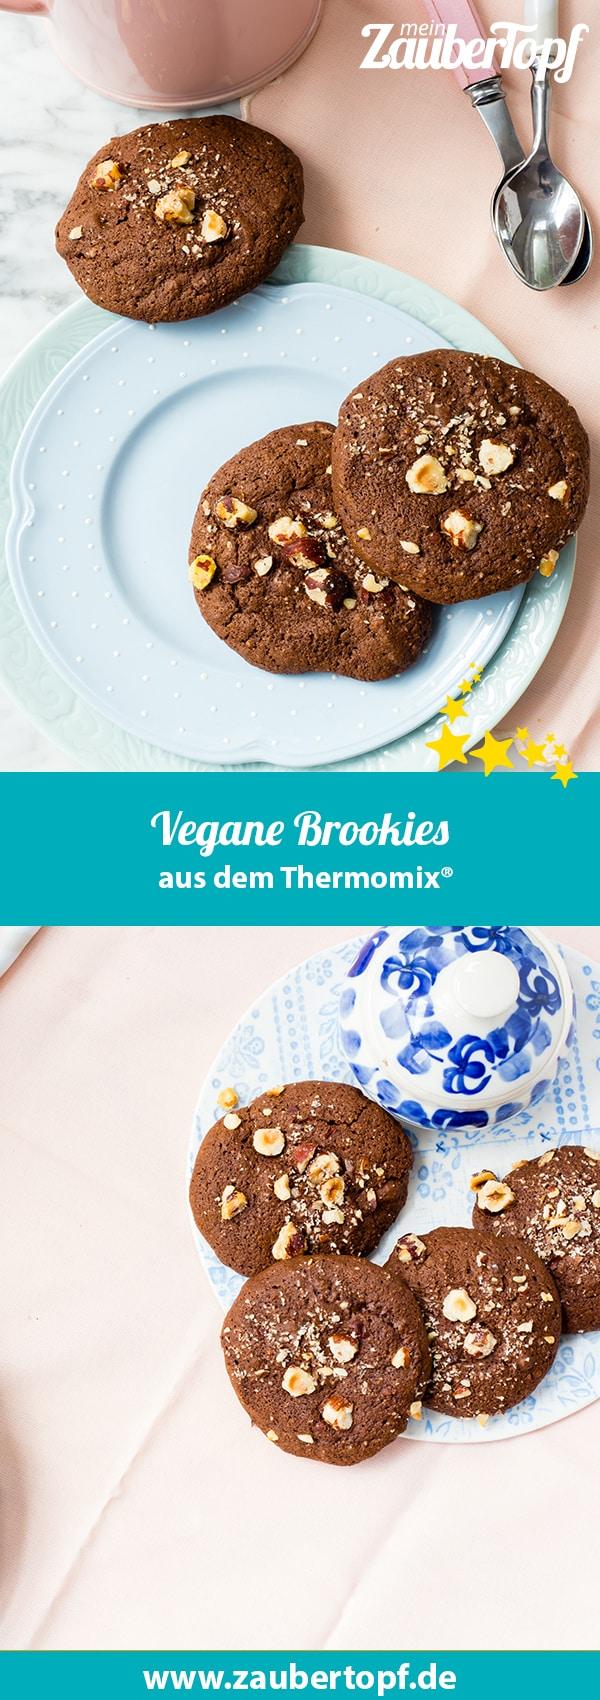 Vegane Brookies mit dem Thermomix® –Foto: Sophia Handschuh